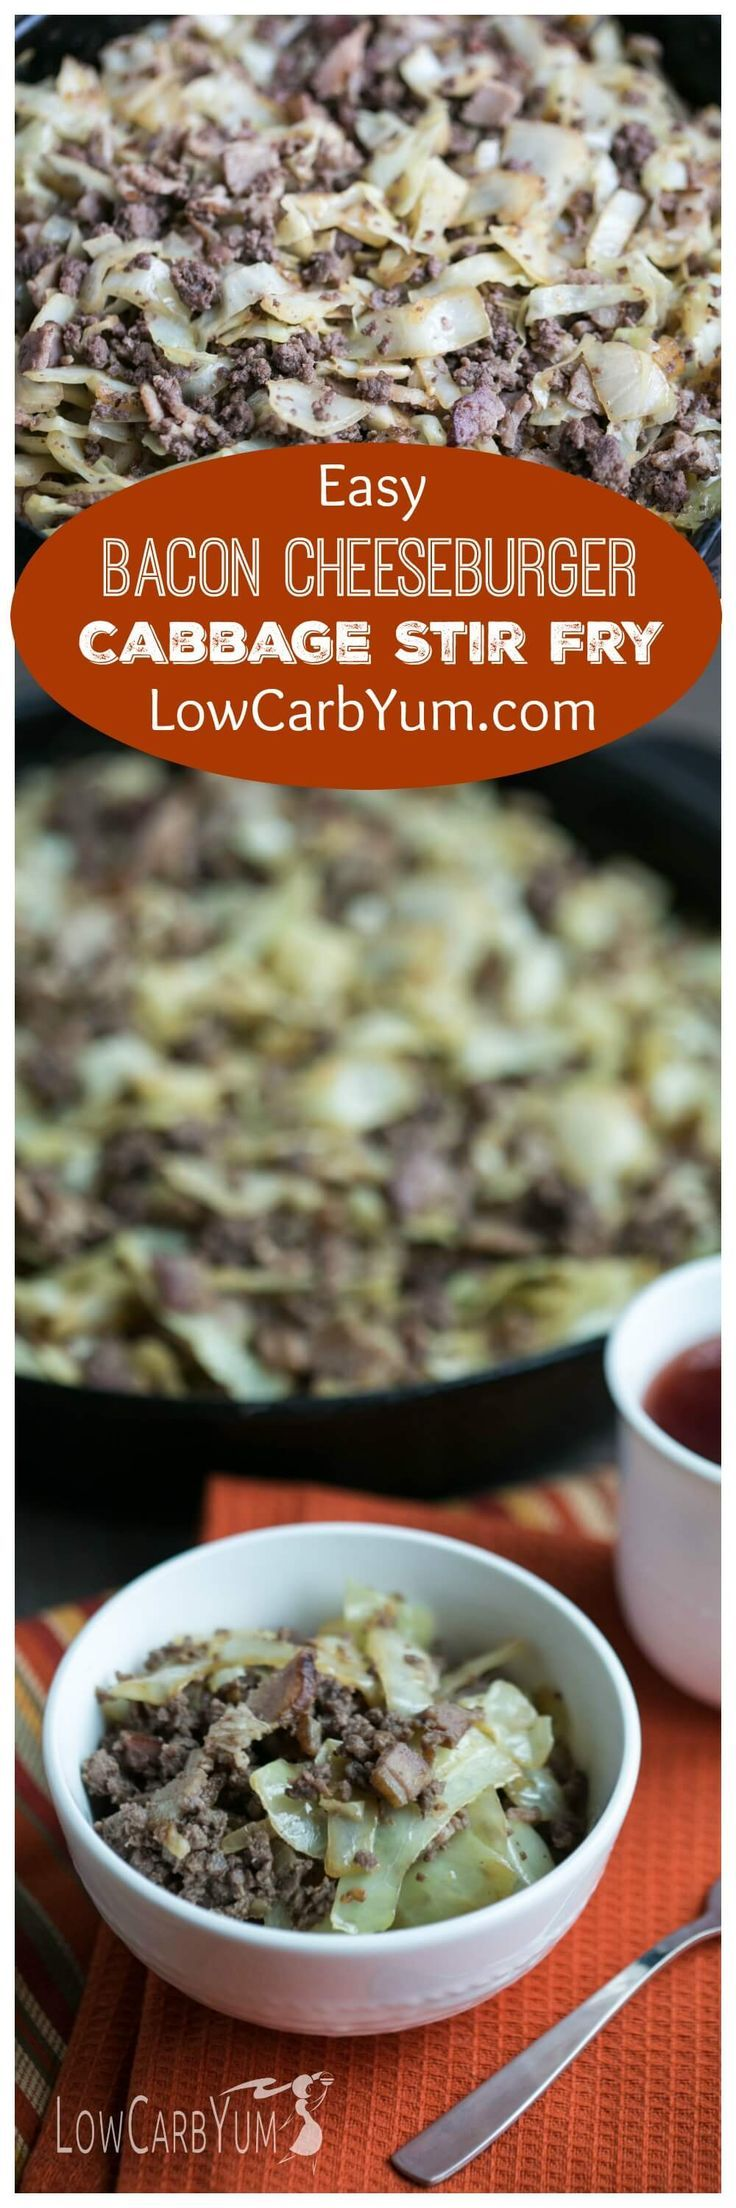 Bacon Burger Cabbage Stir Fry Skillet Dish